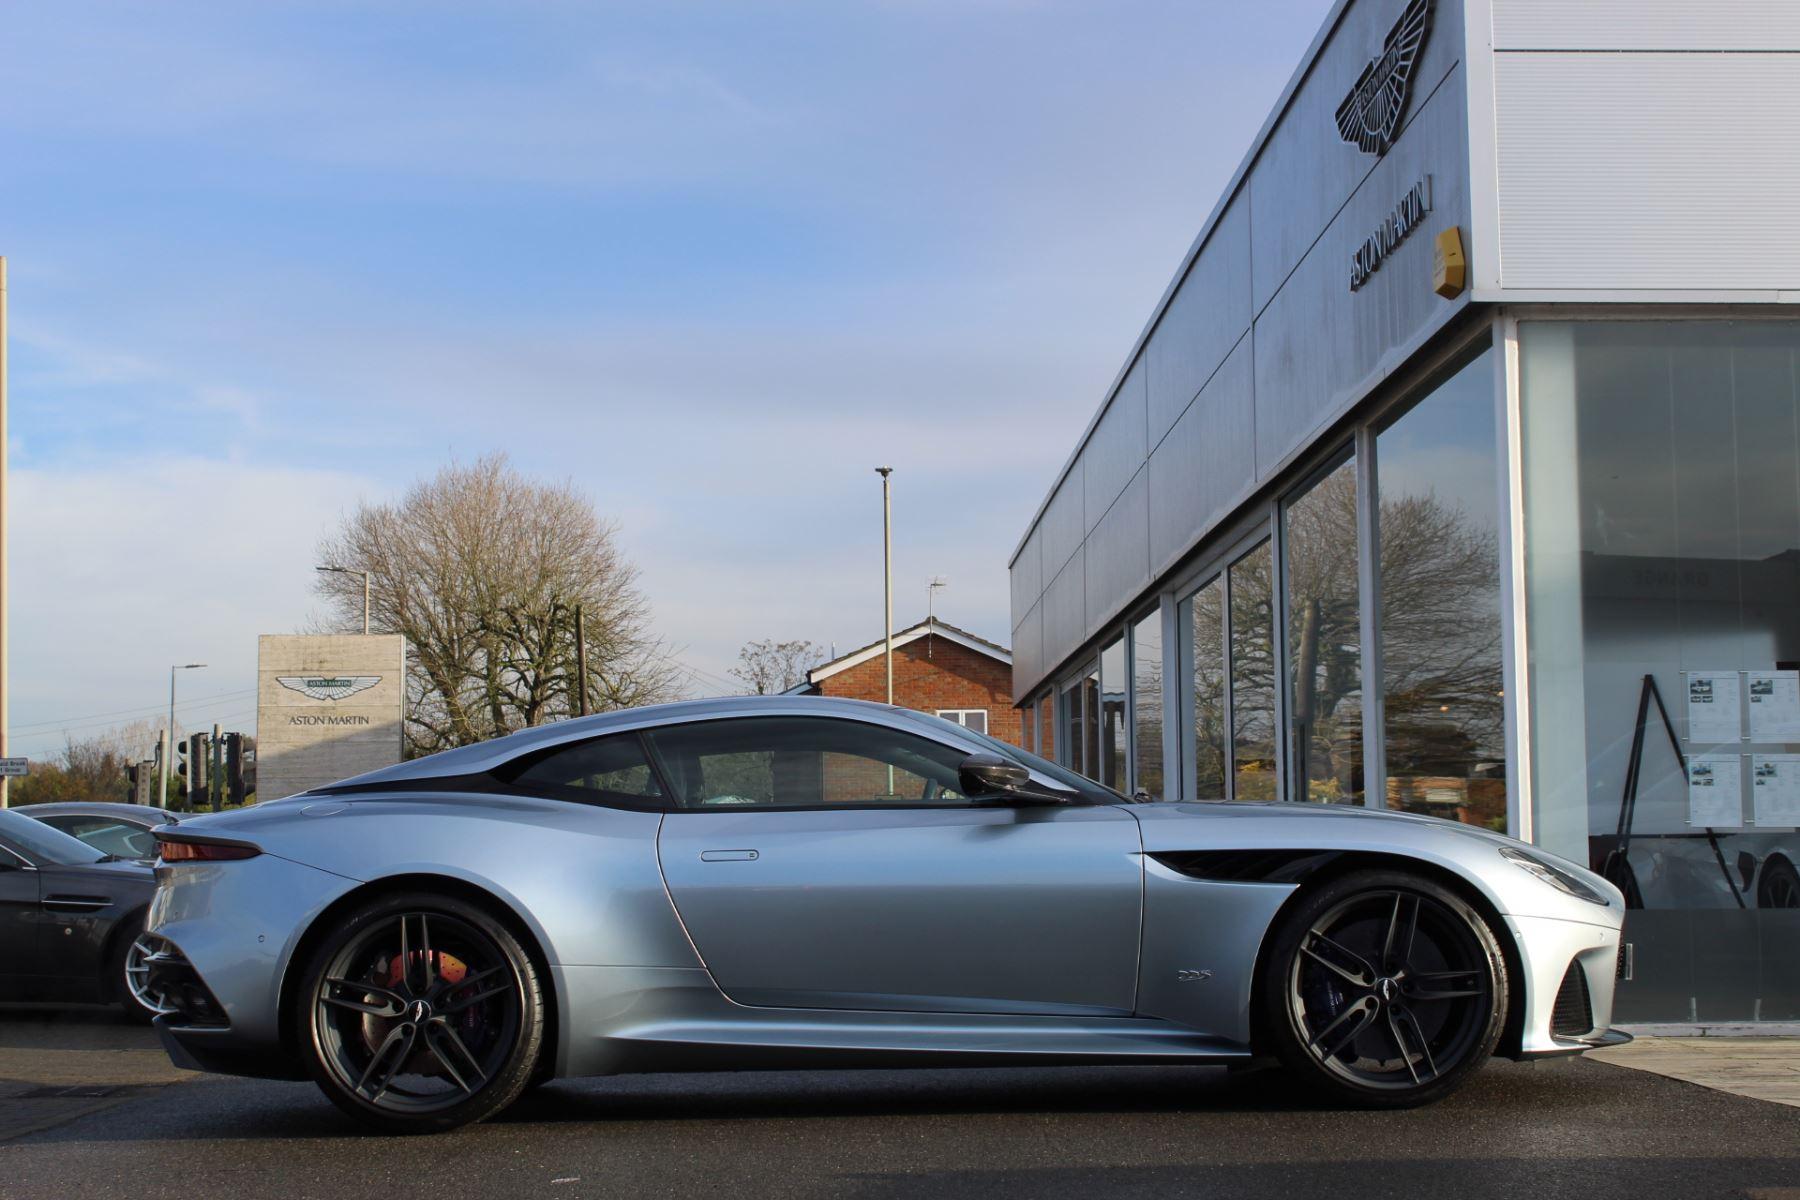 Aston Martin DBS Superleggera V12 2dr Touchtronic image 7